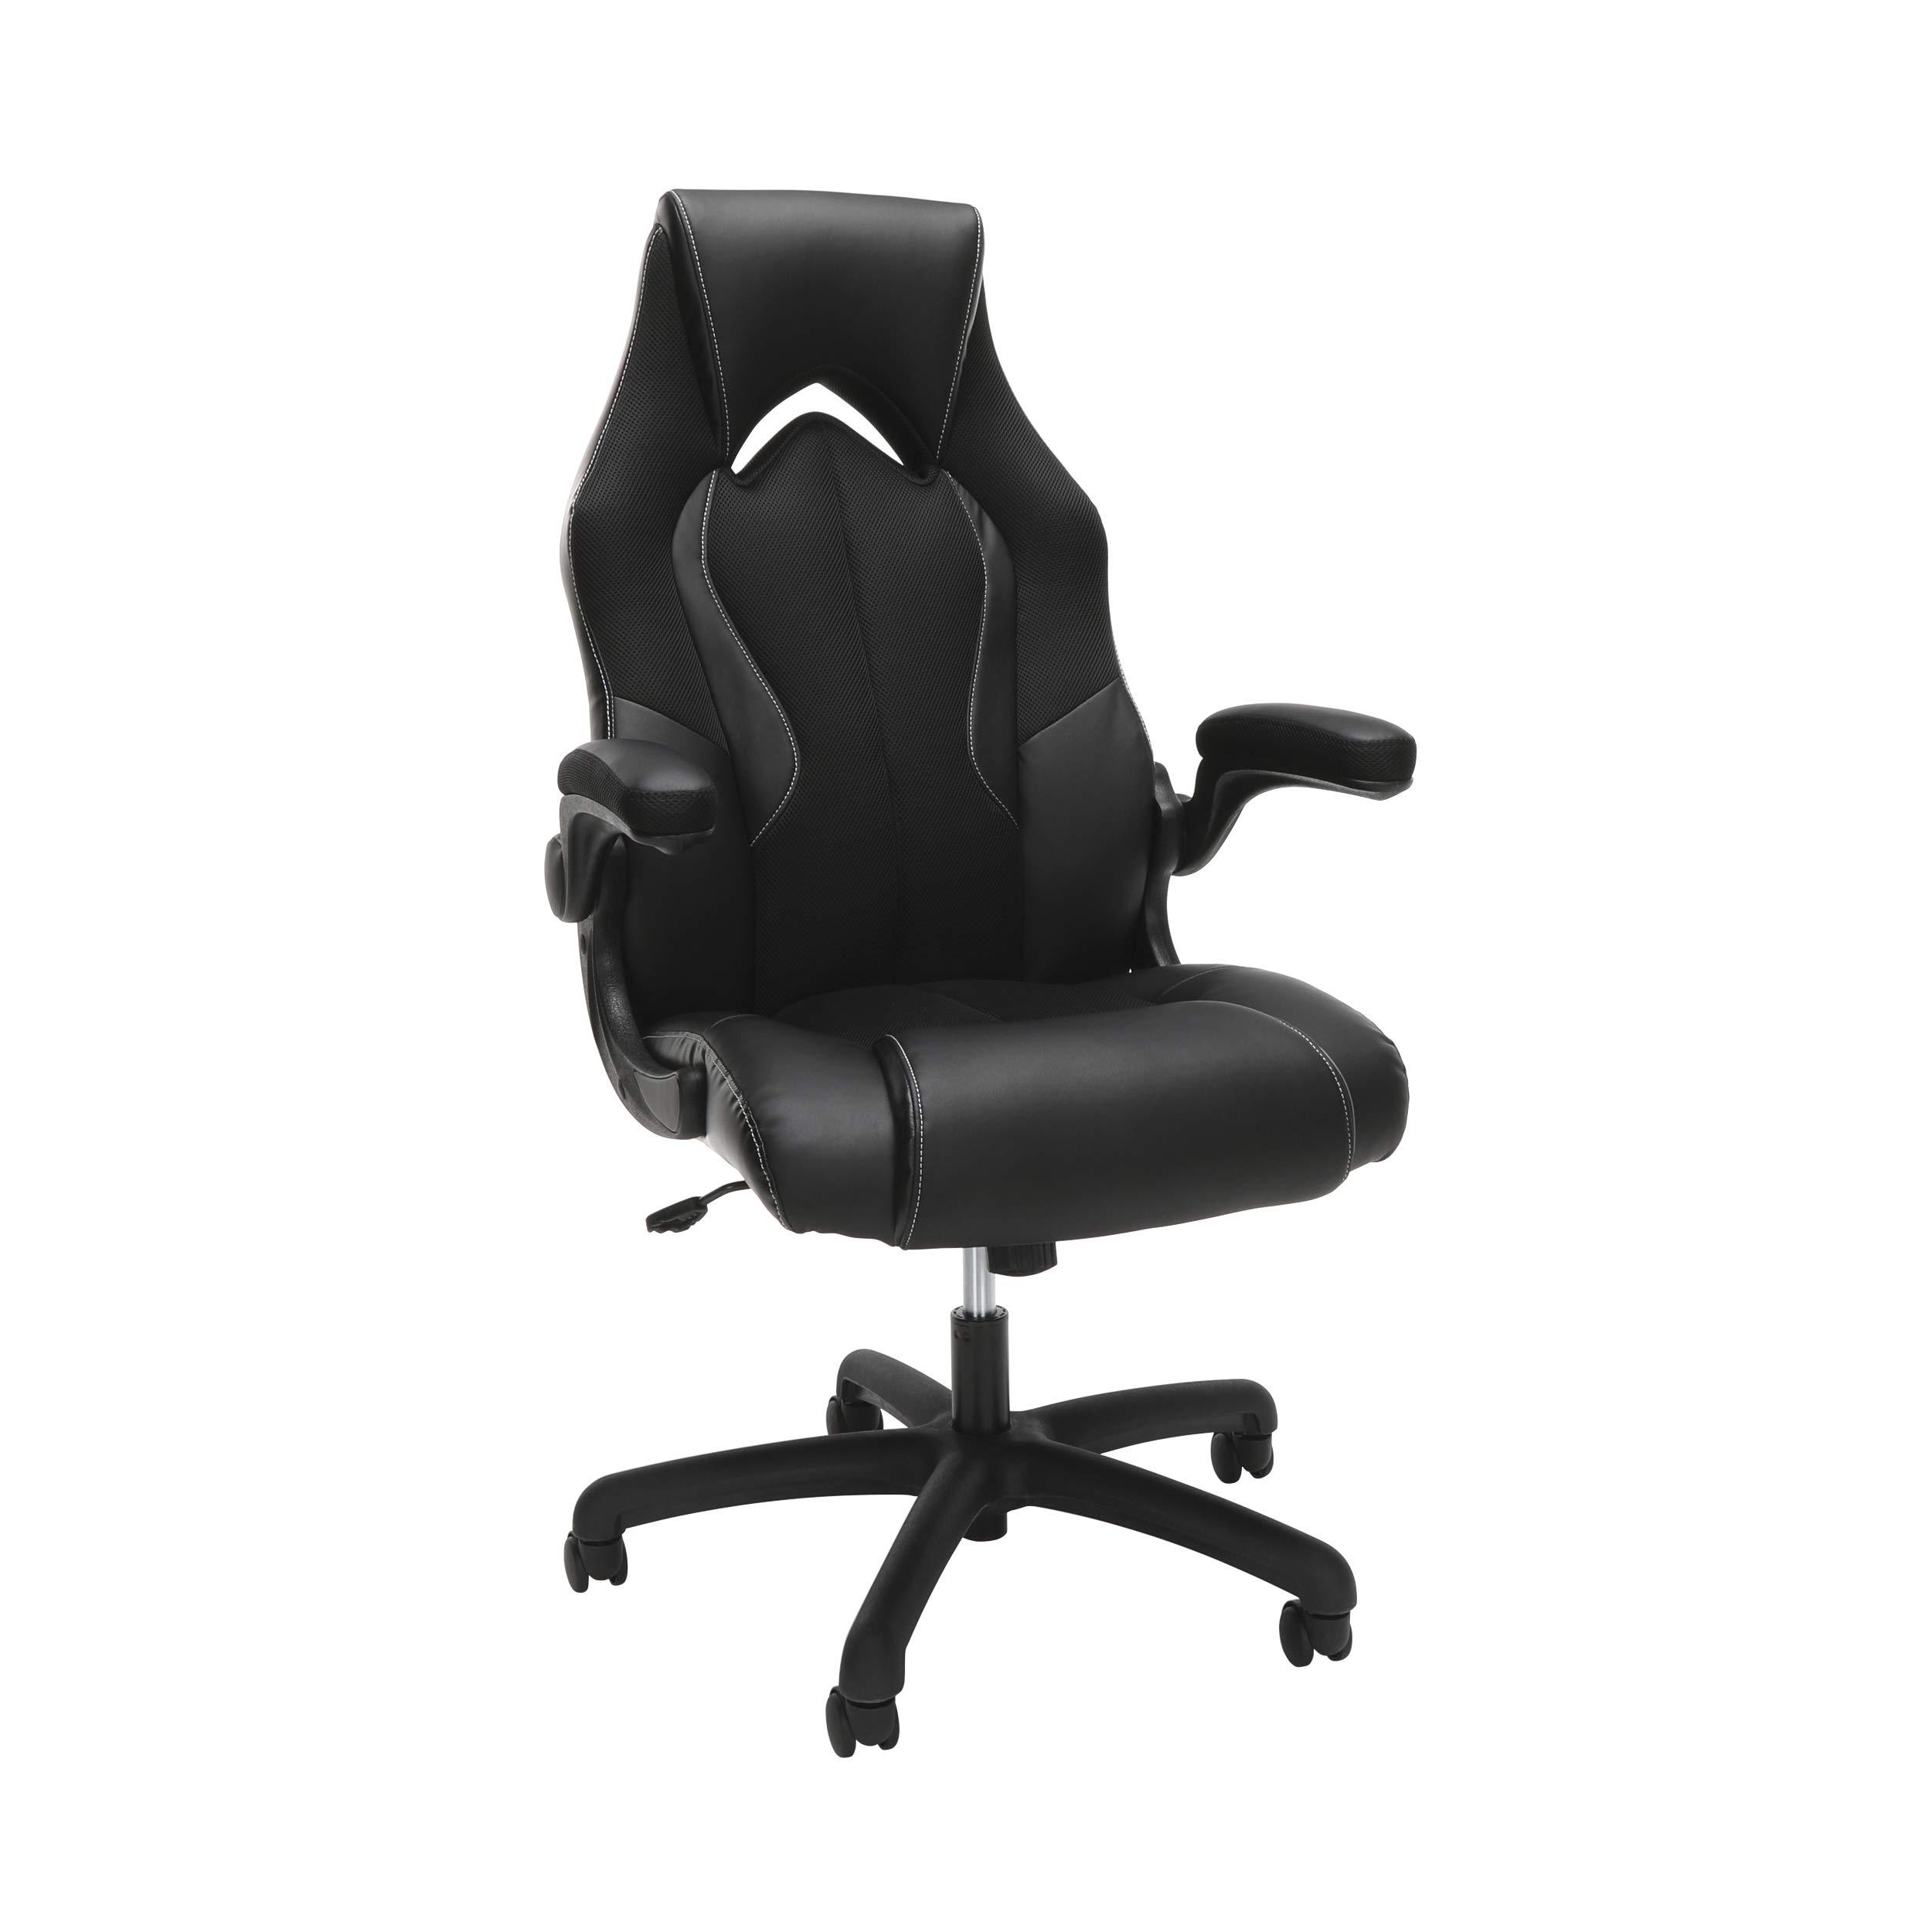 Video Game Chairs Dubai | Online Video Game Chairs Shop UAE